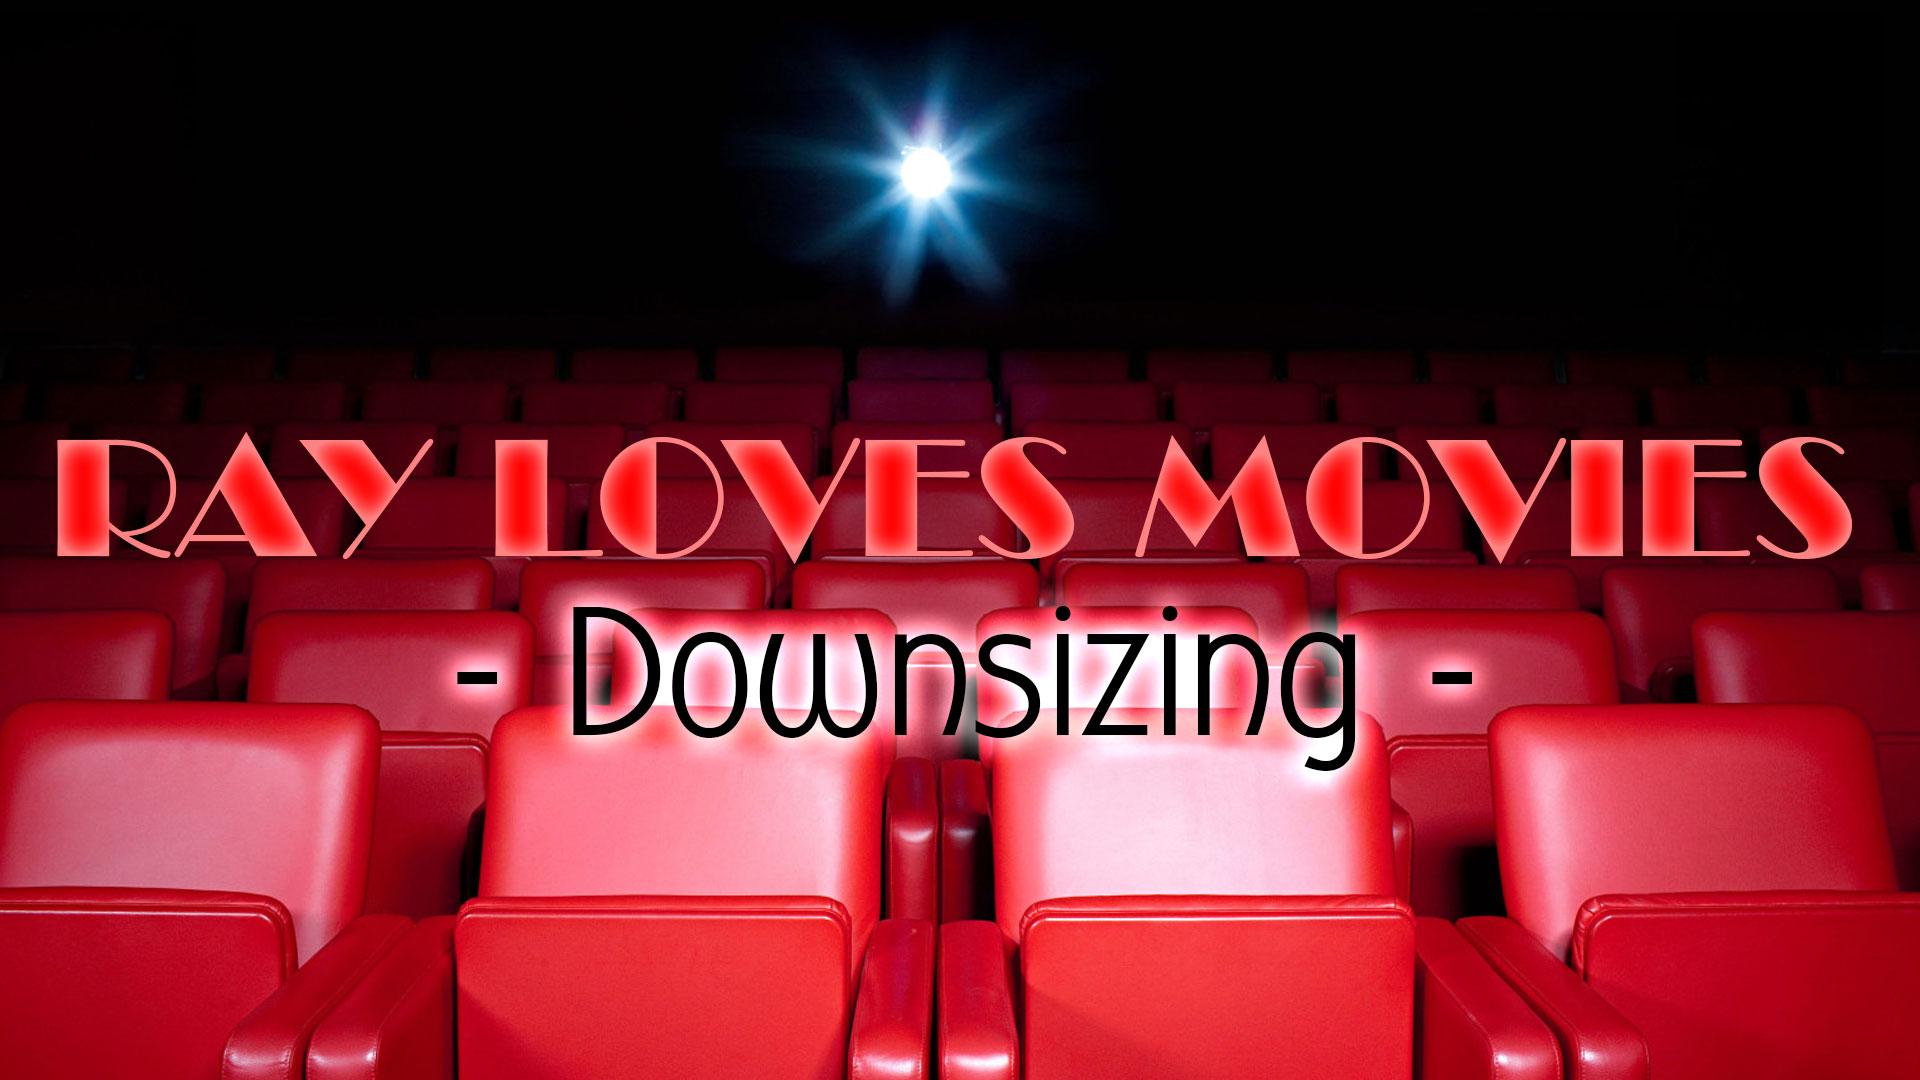 RLM-downsizing.jpg